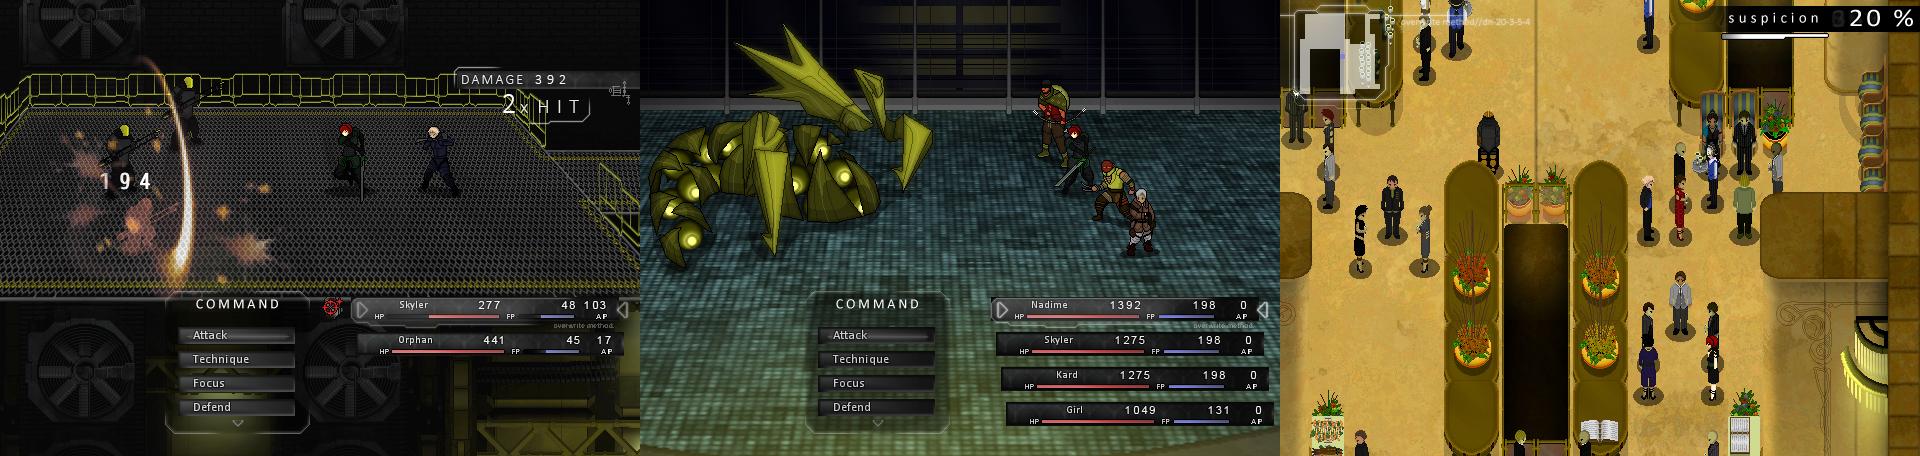 (game screenshots)